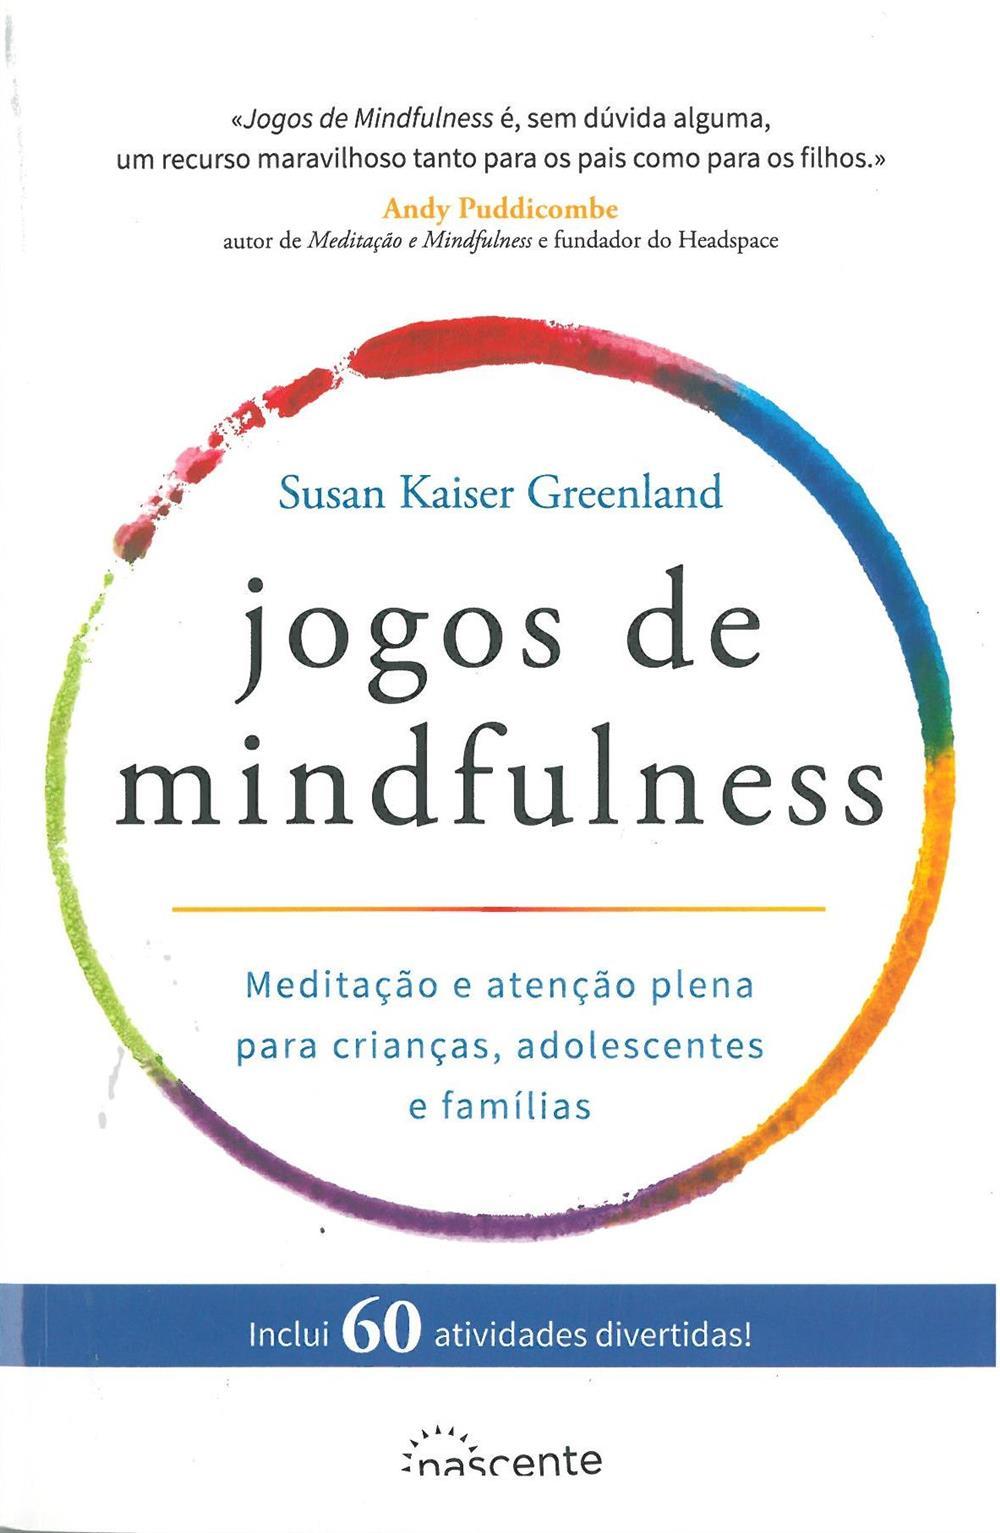 Jogos de mindfulness.jpg